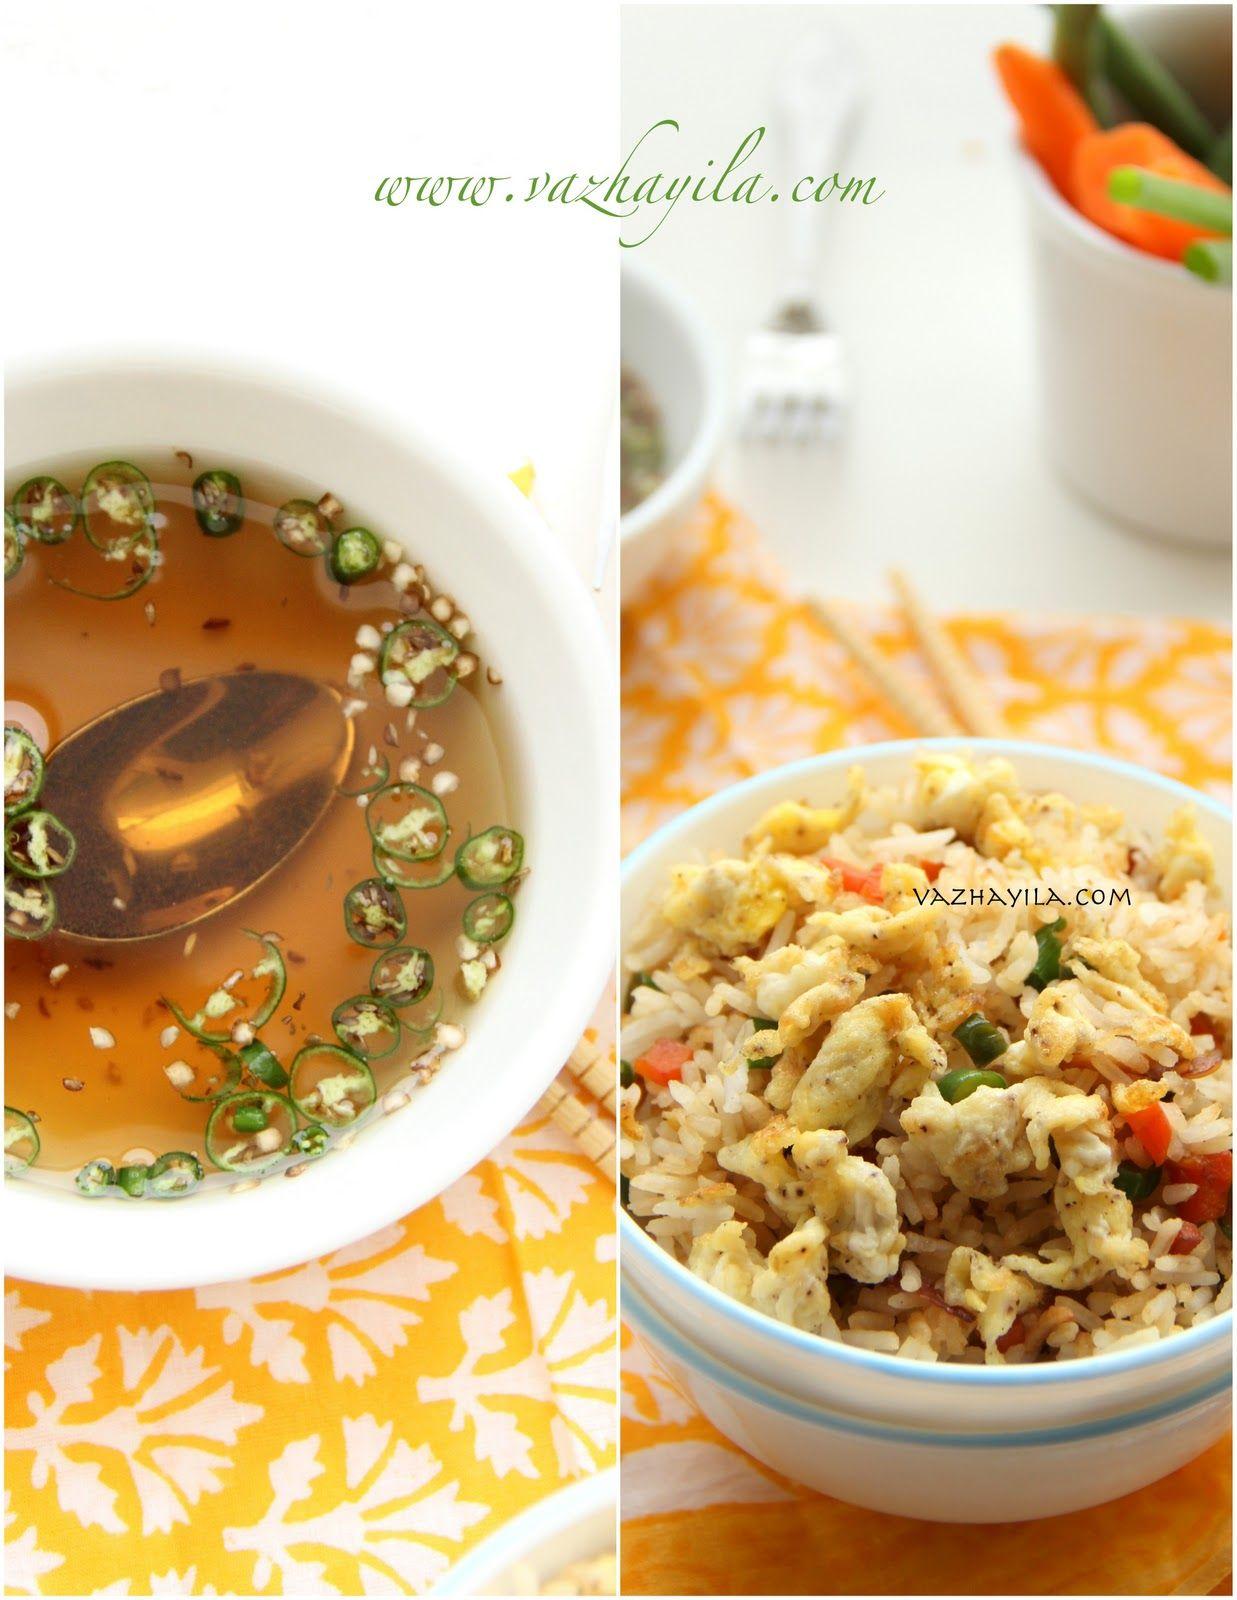 Vazhayila.com: Egg Fried Rice - Kerala style | Fried rice ...